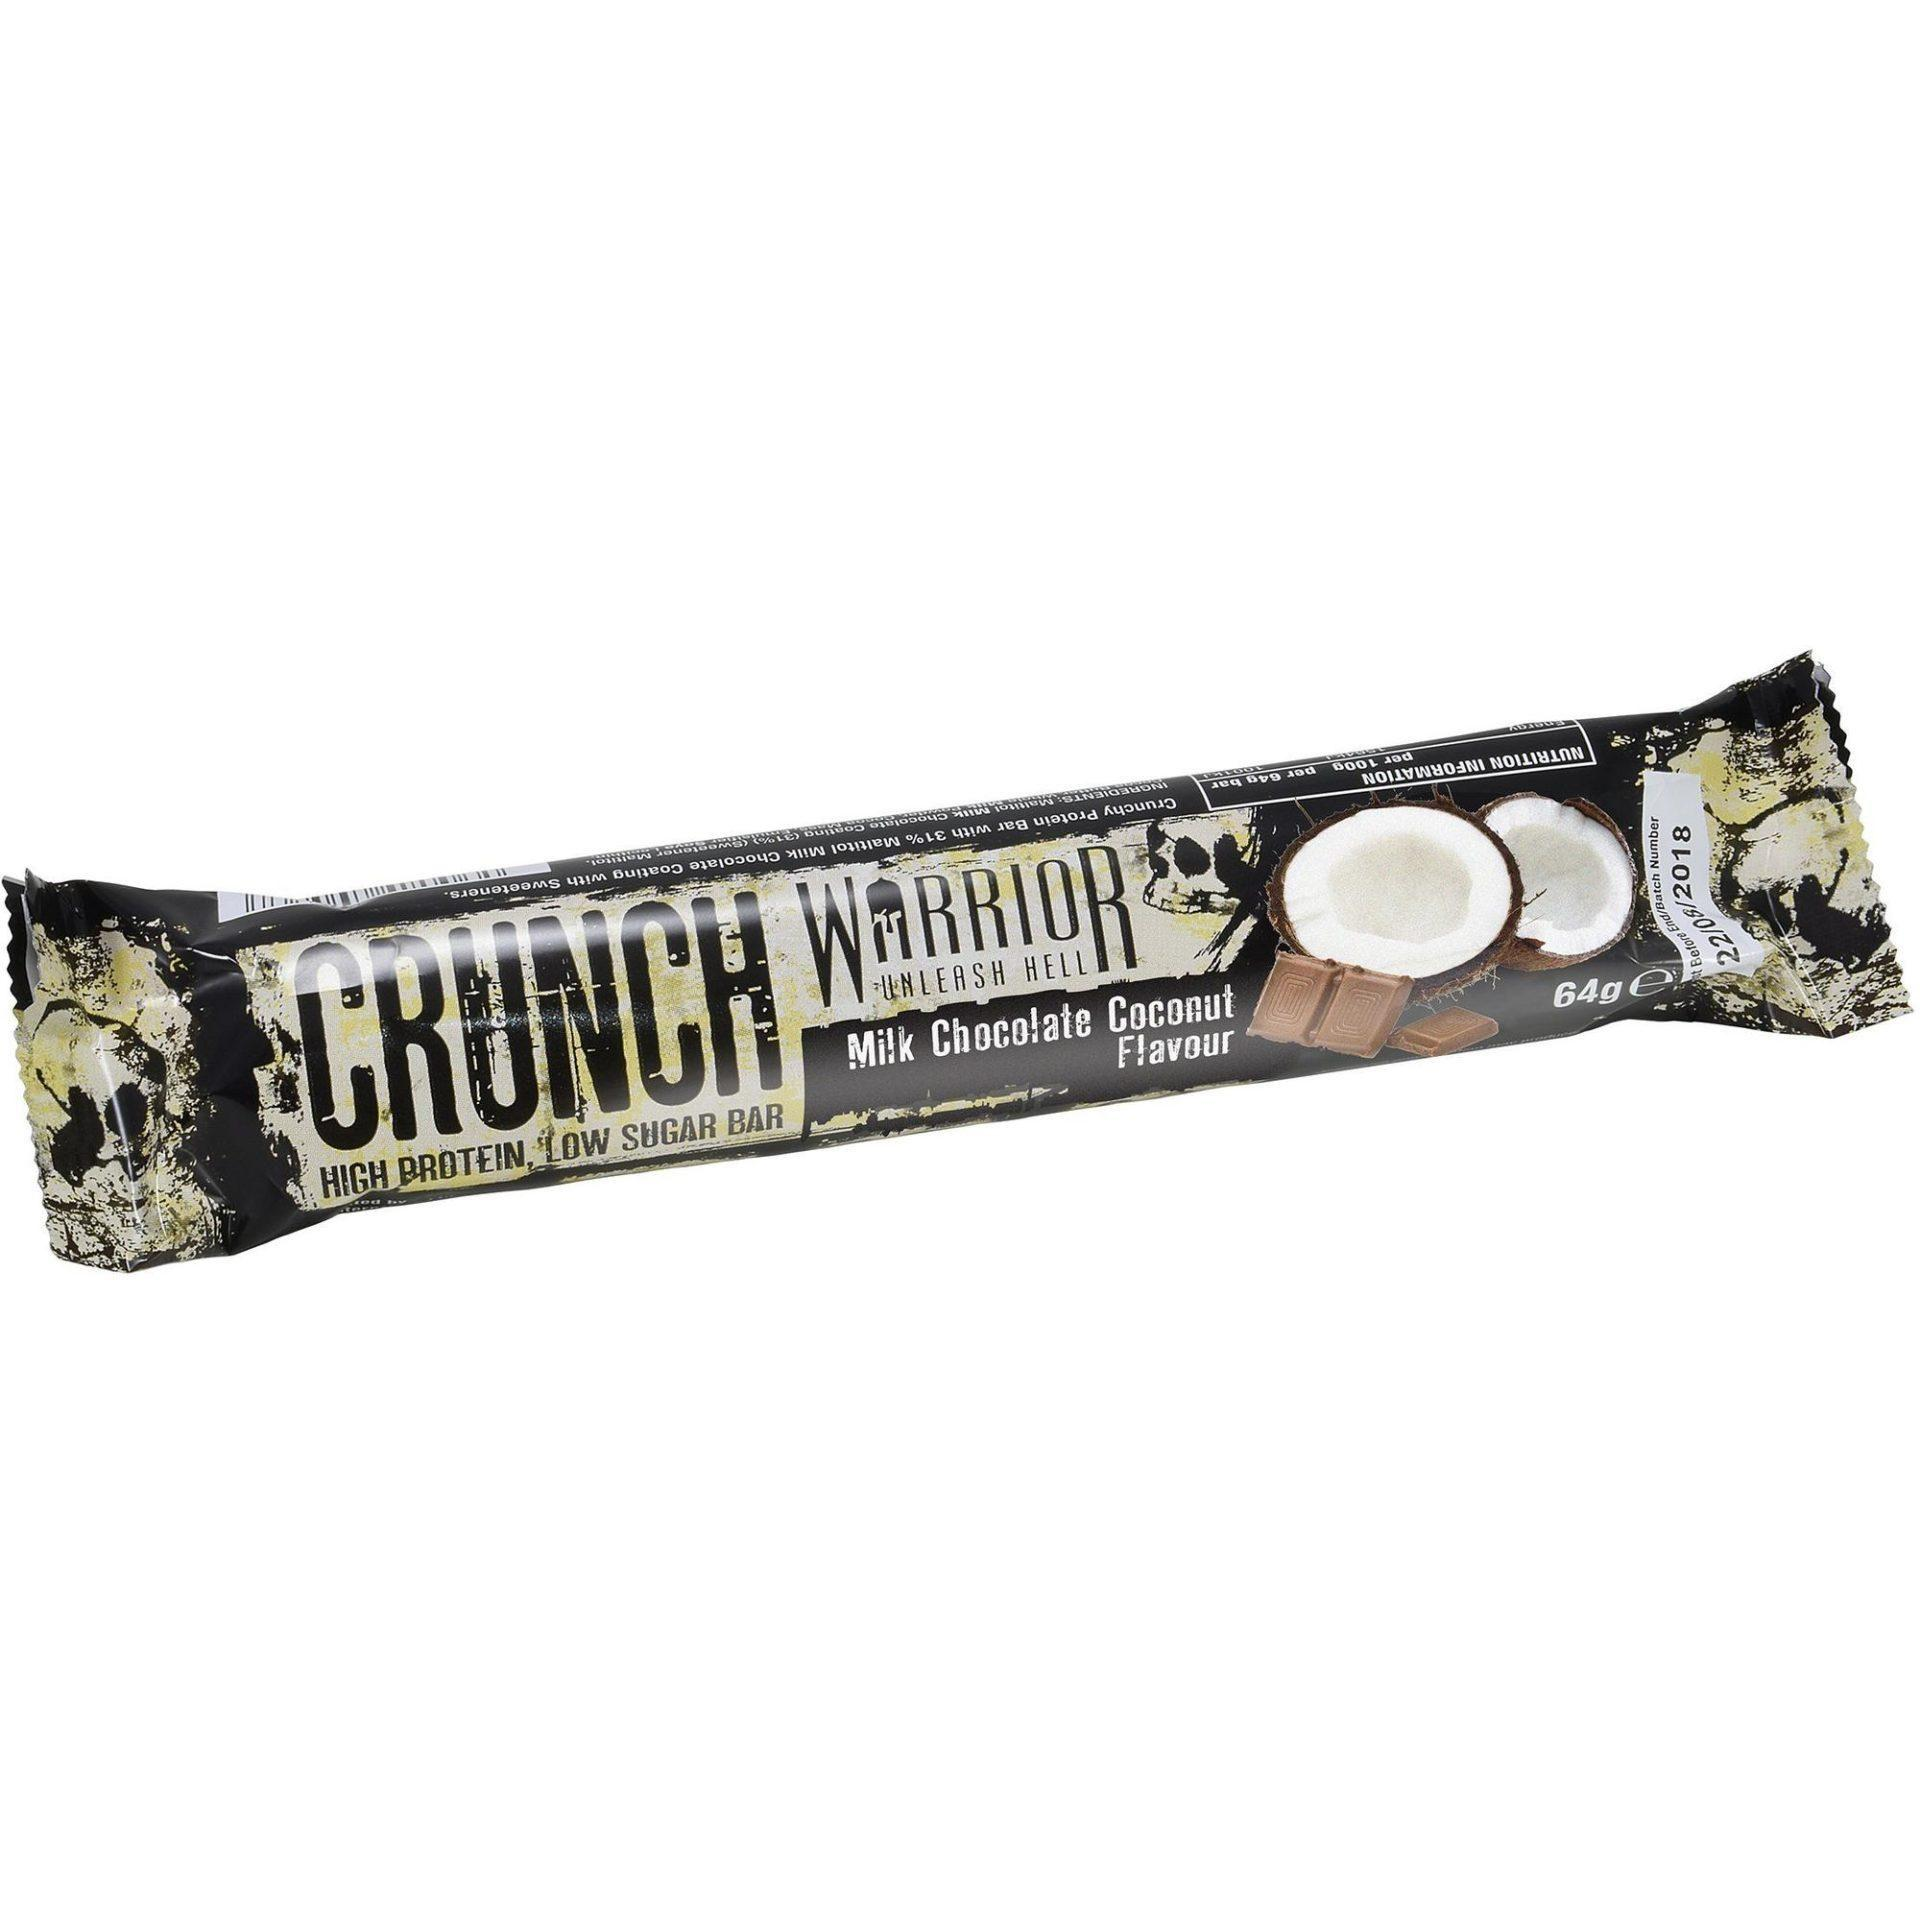 warrior-supplements-protein-bars-1-bar-milk-chocolate-coconut-warrior-crunch-protein-bars-posted-protein-24709339984_2000x